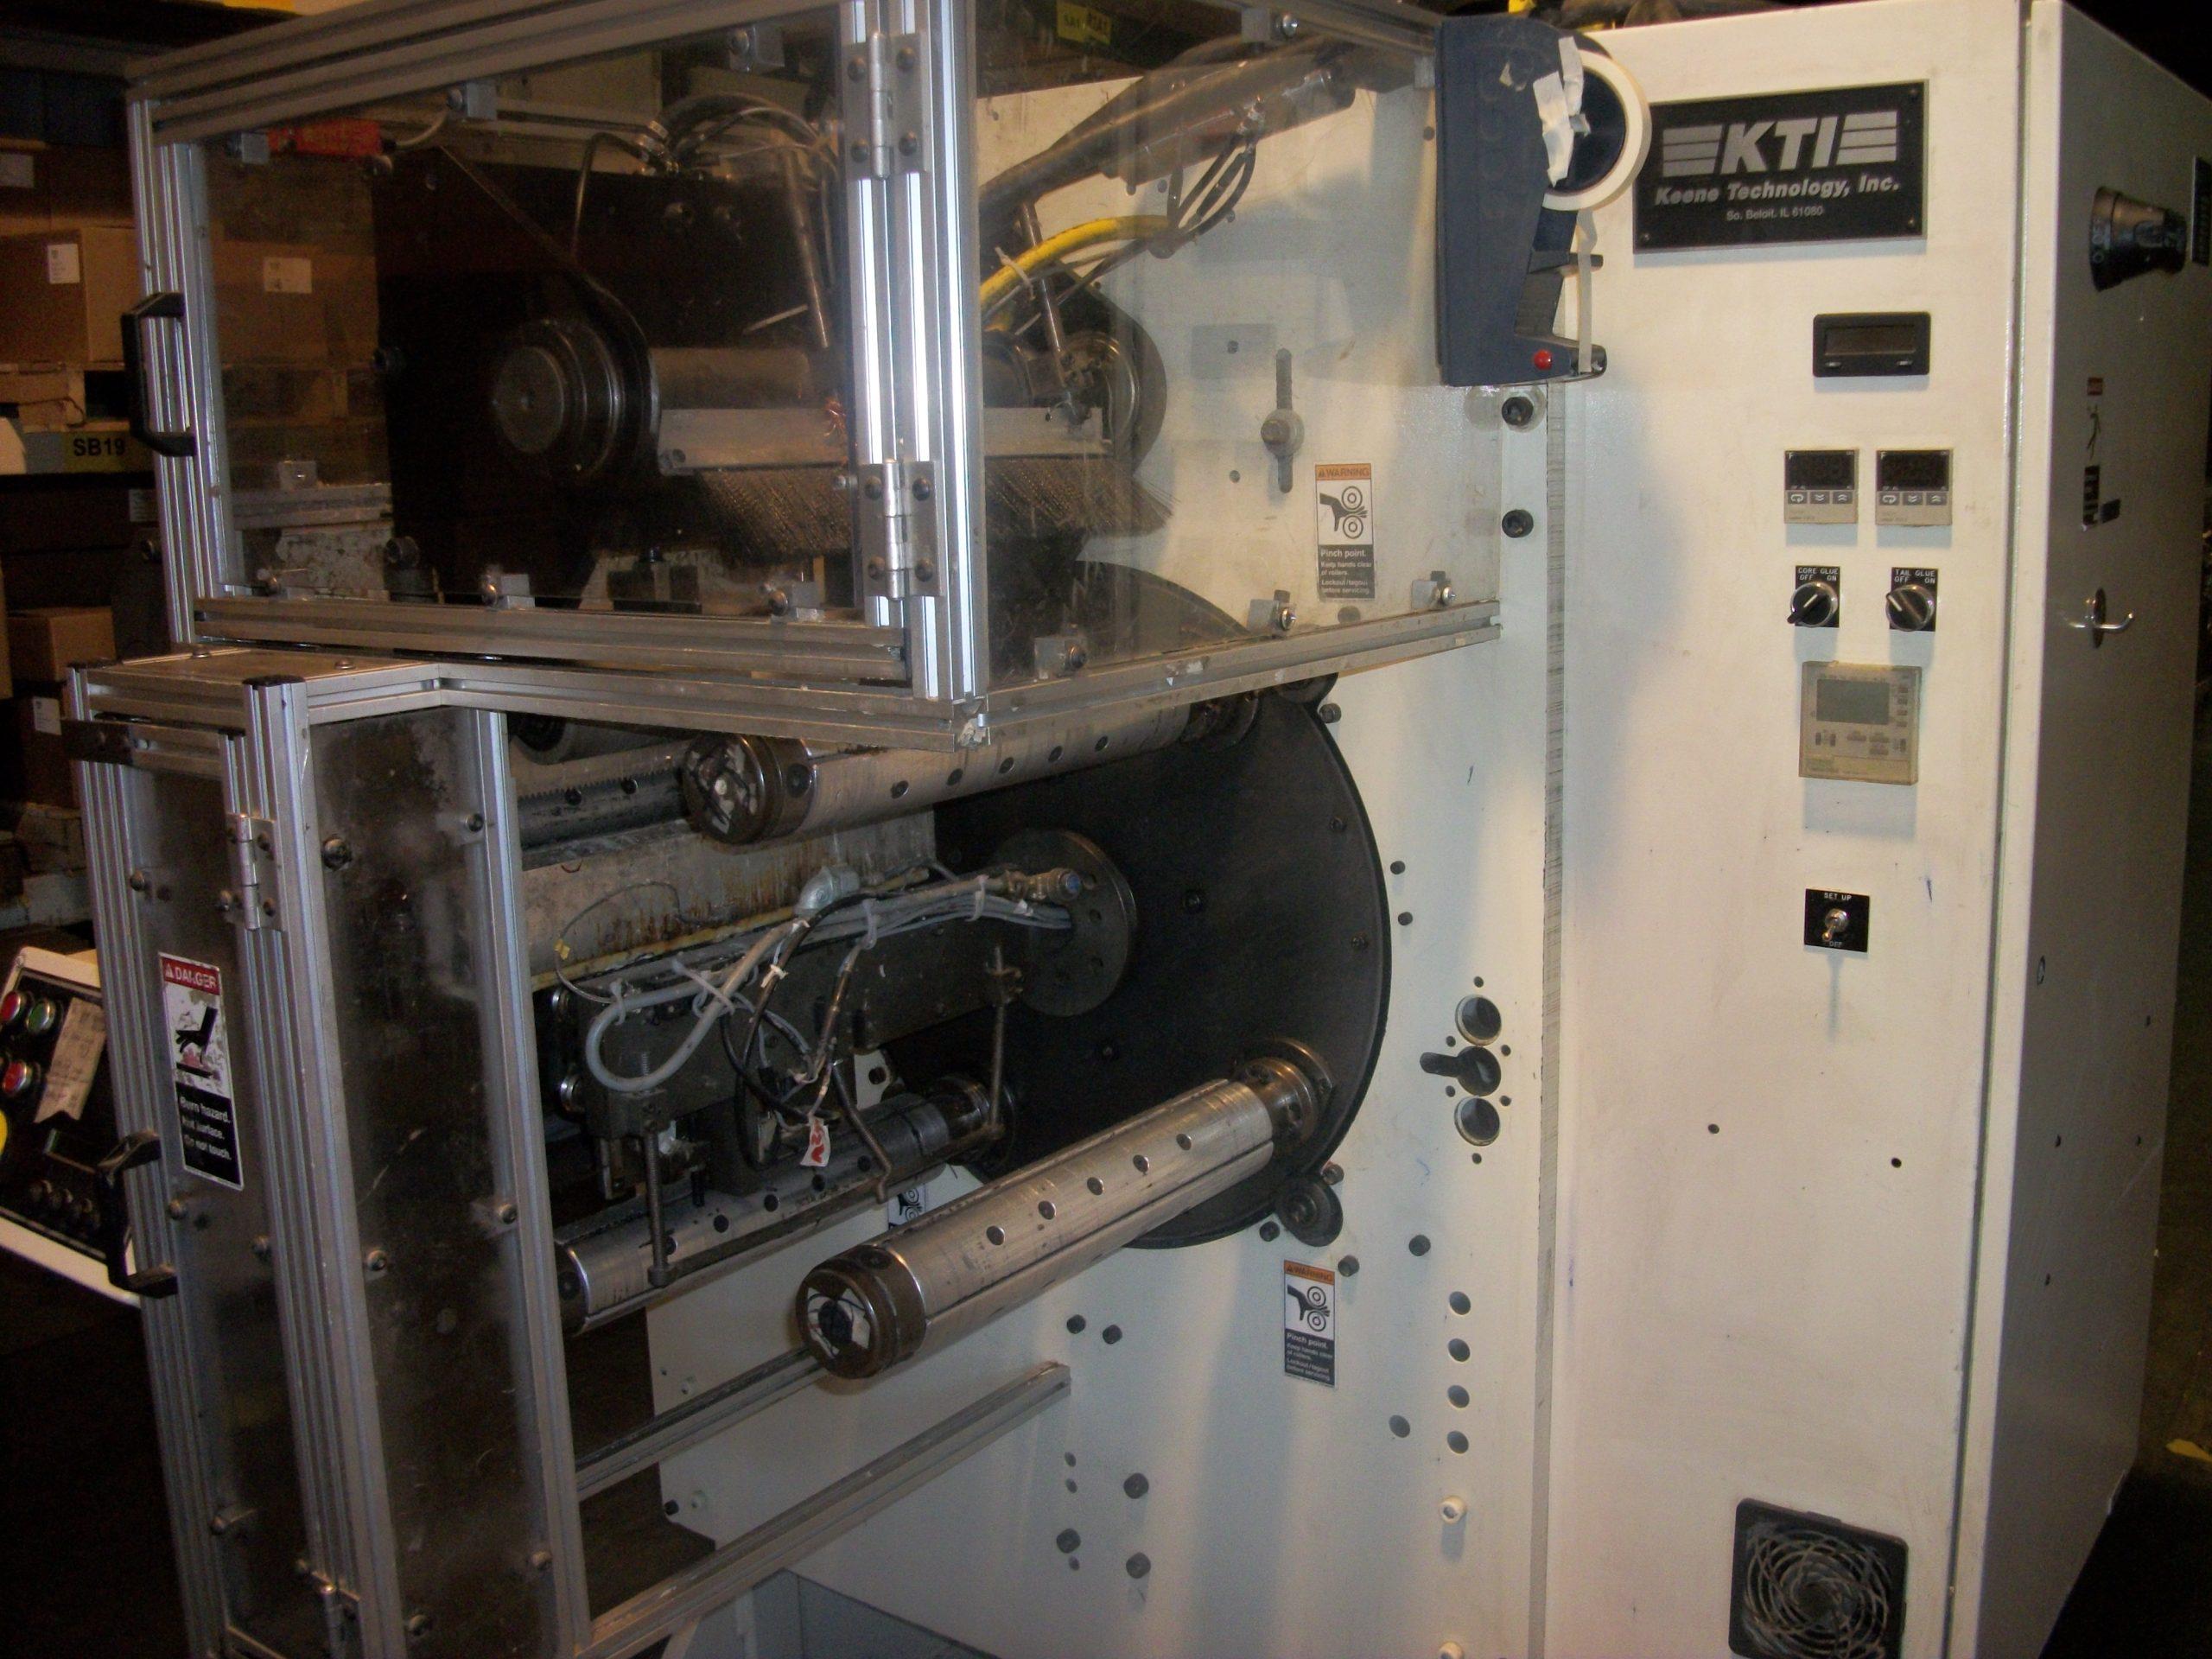 KTI JR1312 Turret Rewinder - Used Flexo Printing Presses and Used Flexographic Equipment-2